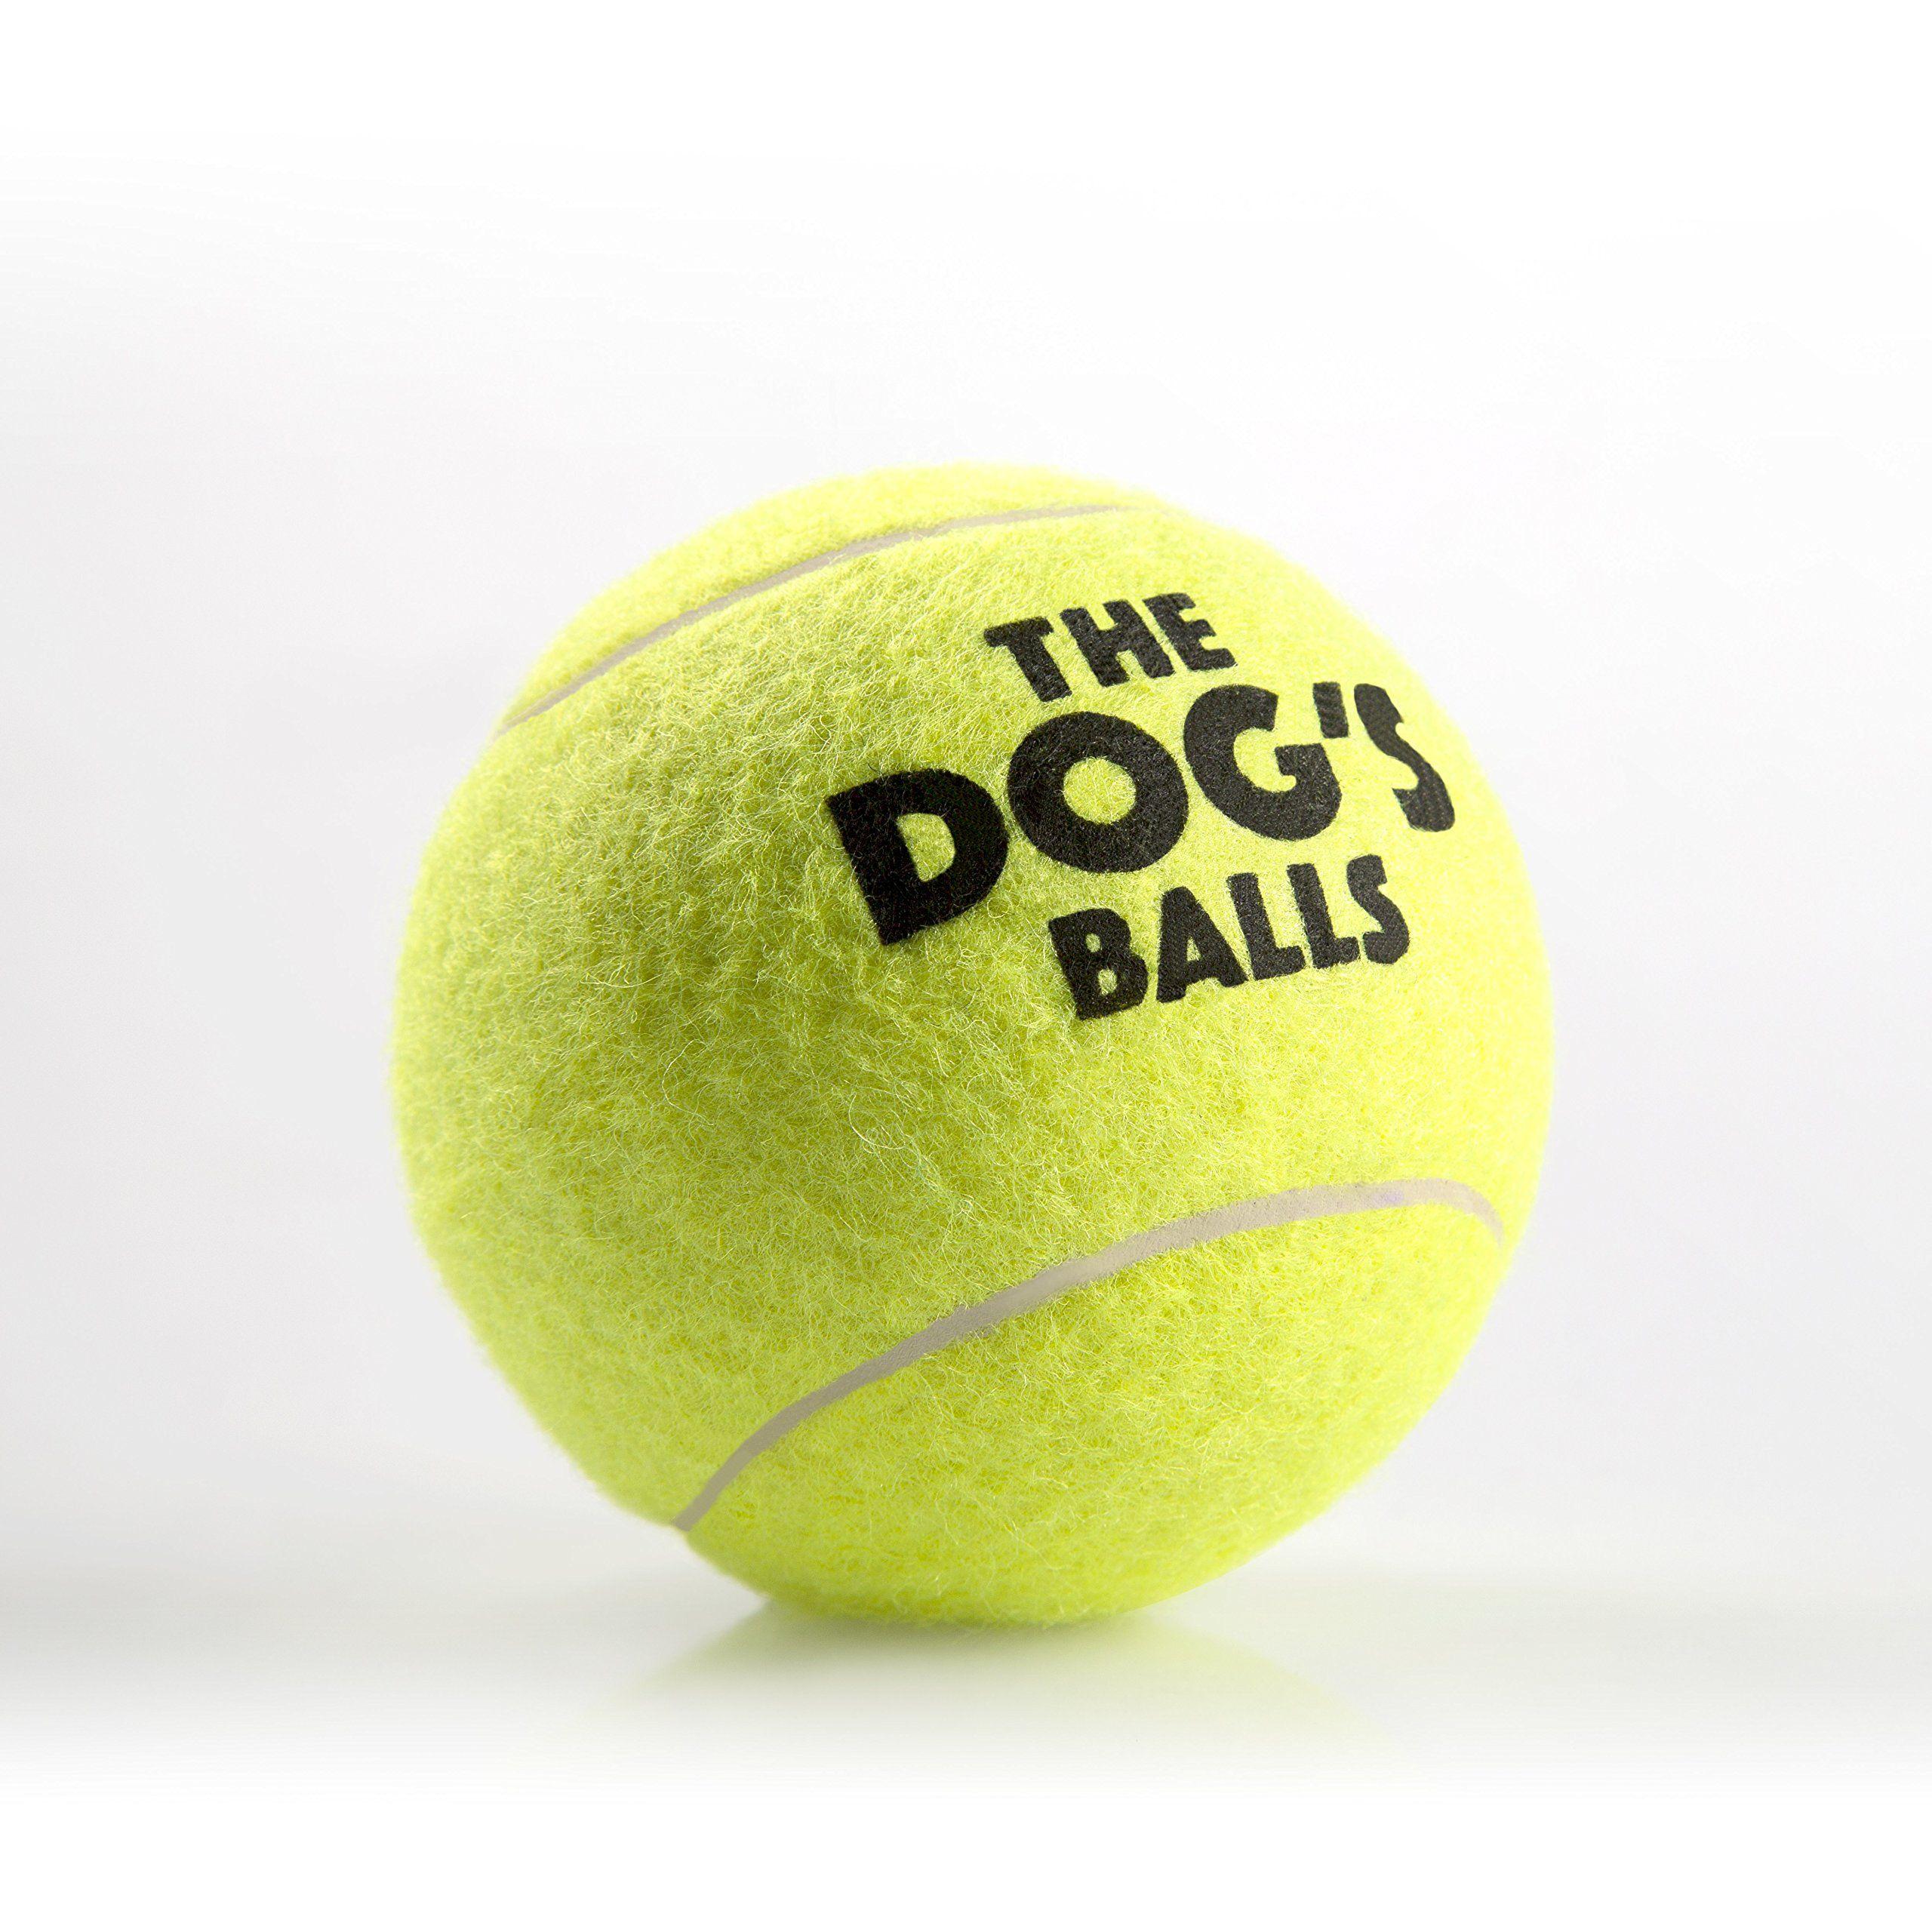 The Dogs Balls 12 Premium Dog Tennis Balls Ball For Puppy Training